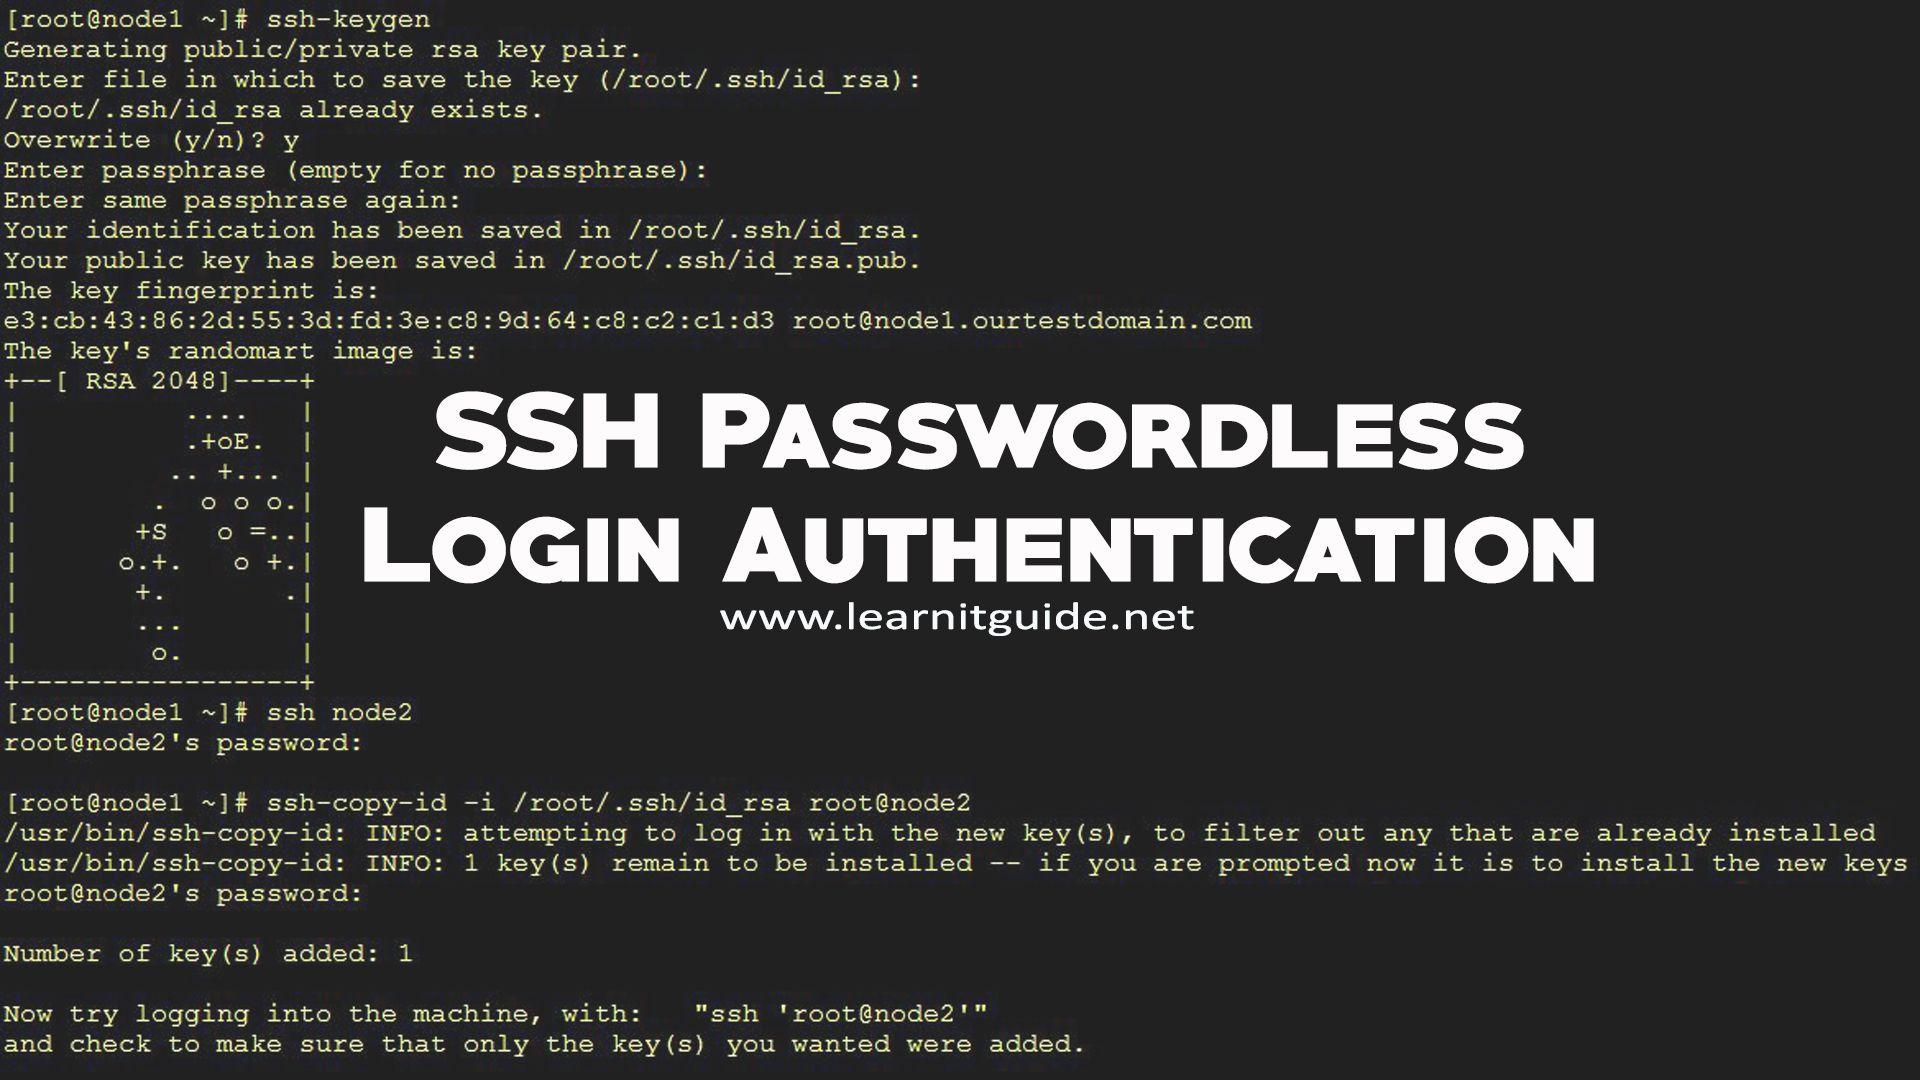 How to Configure SSH Passwordless Login Authentication on